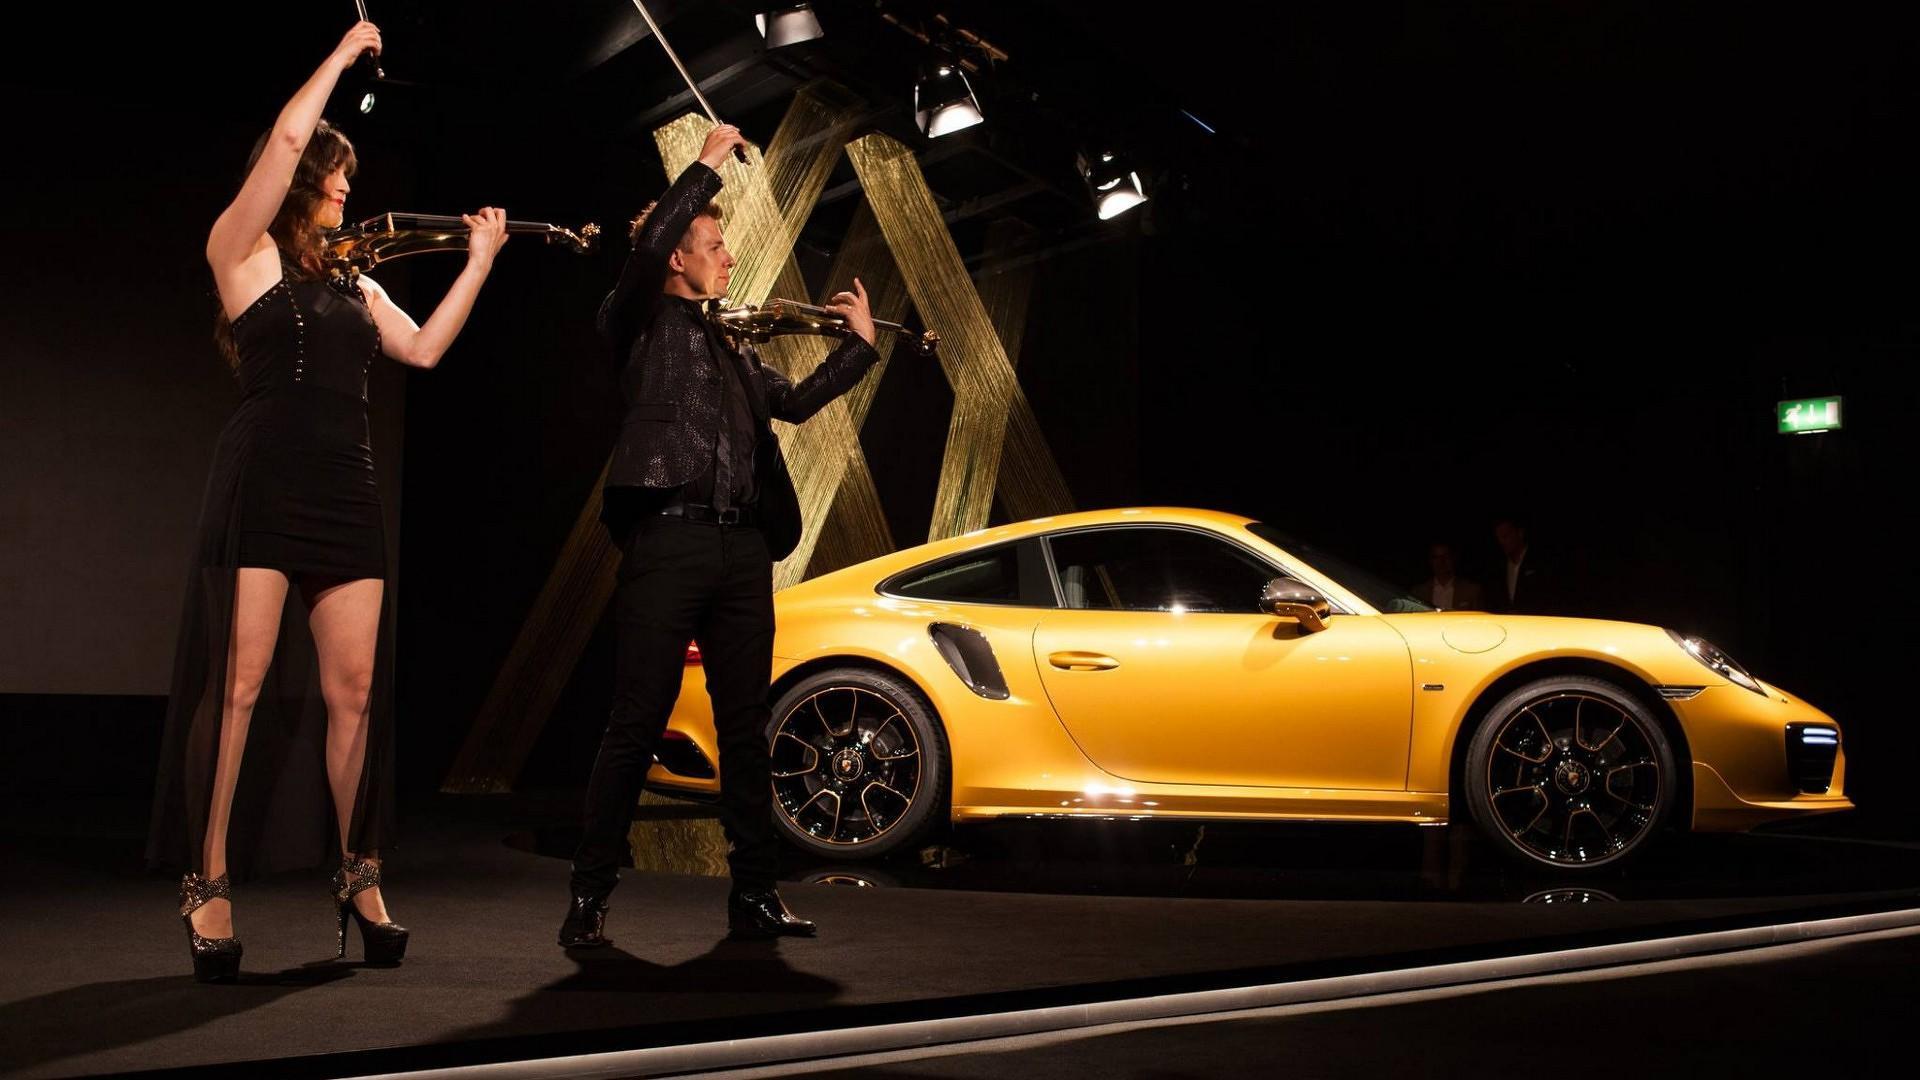 Porsche_911_Turbo_S_Exclusive_Series_07